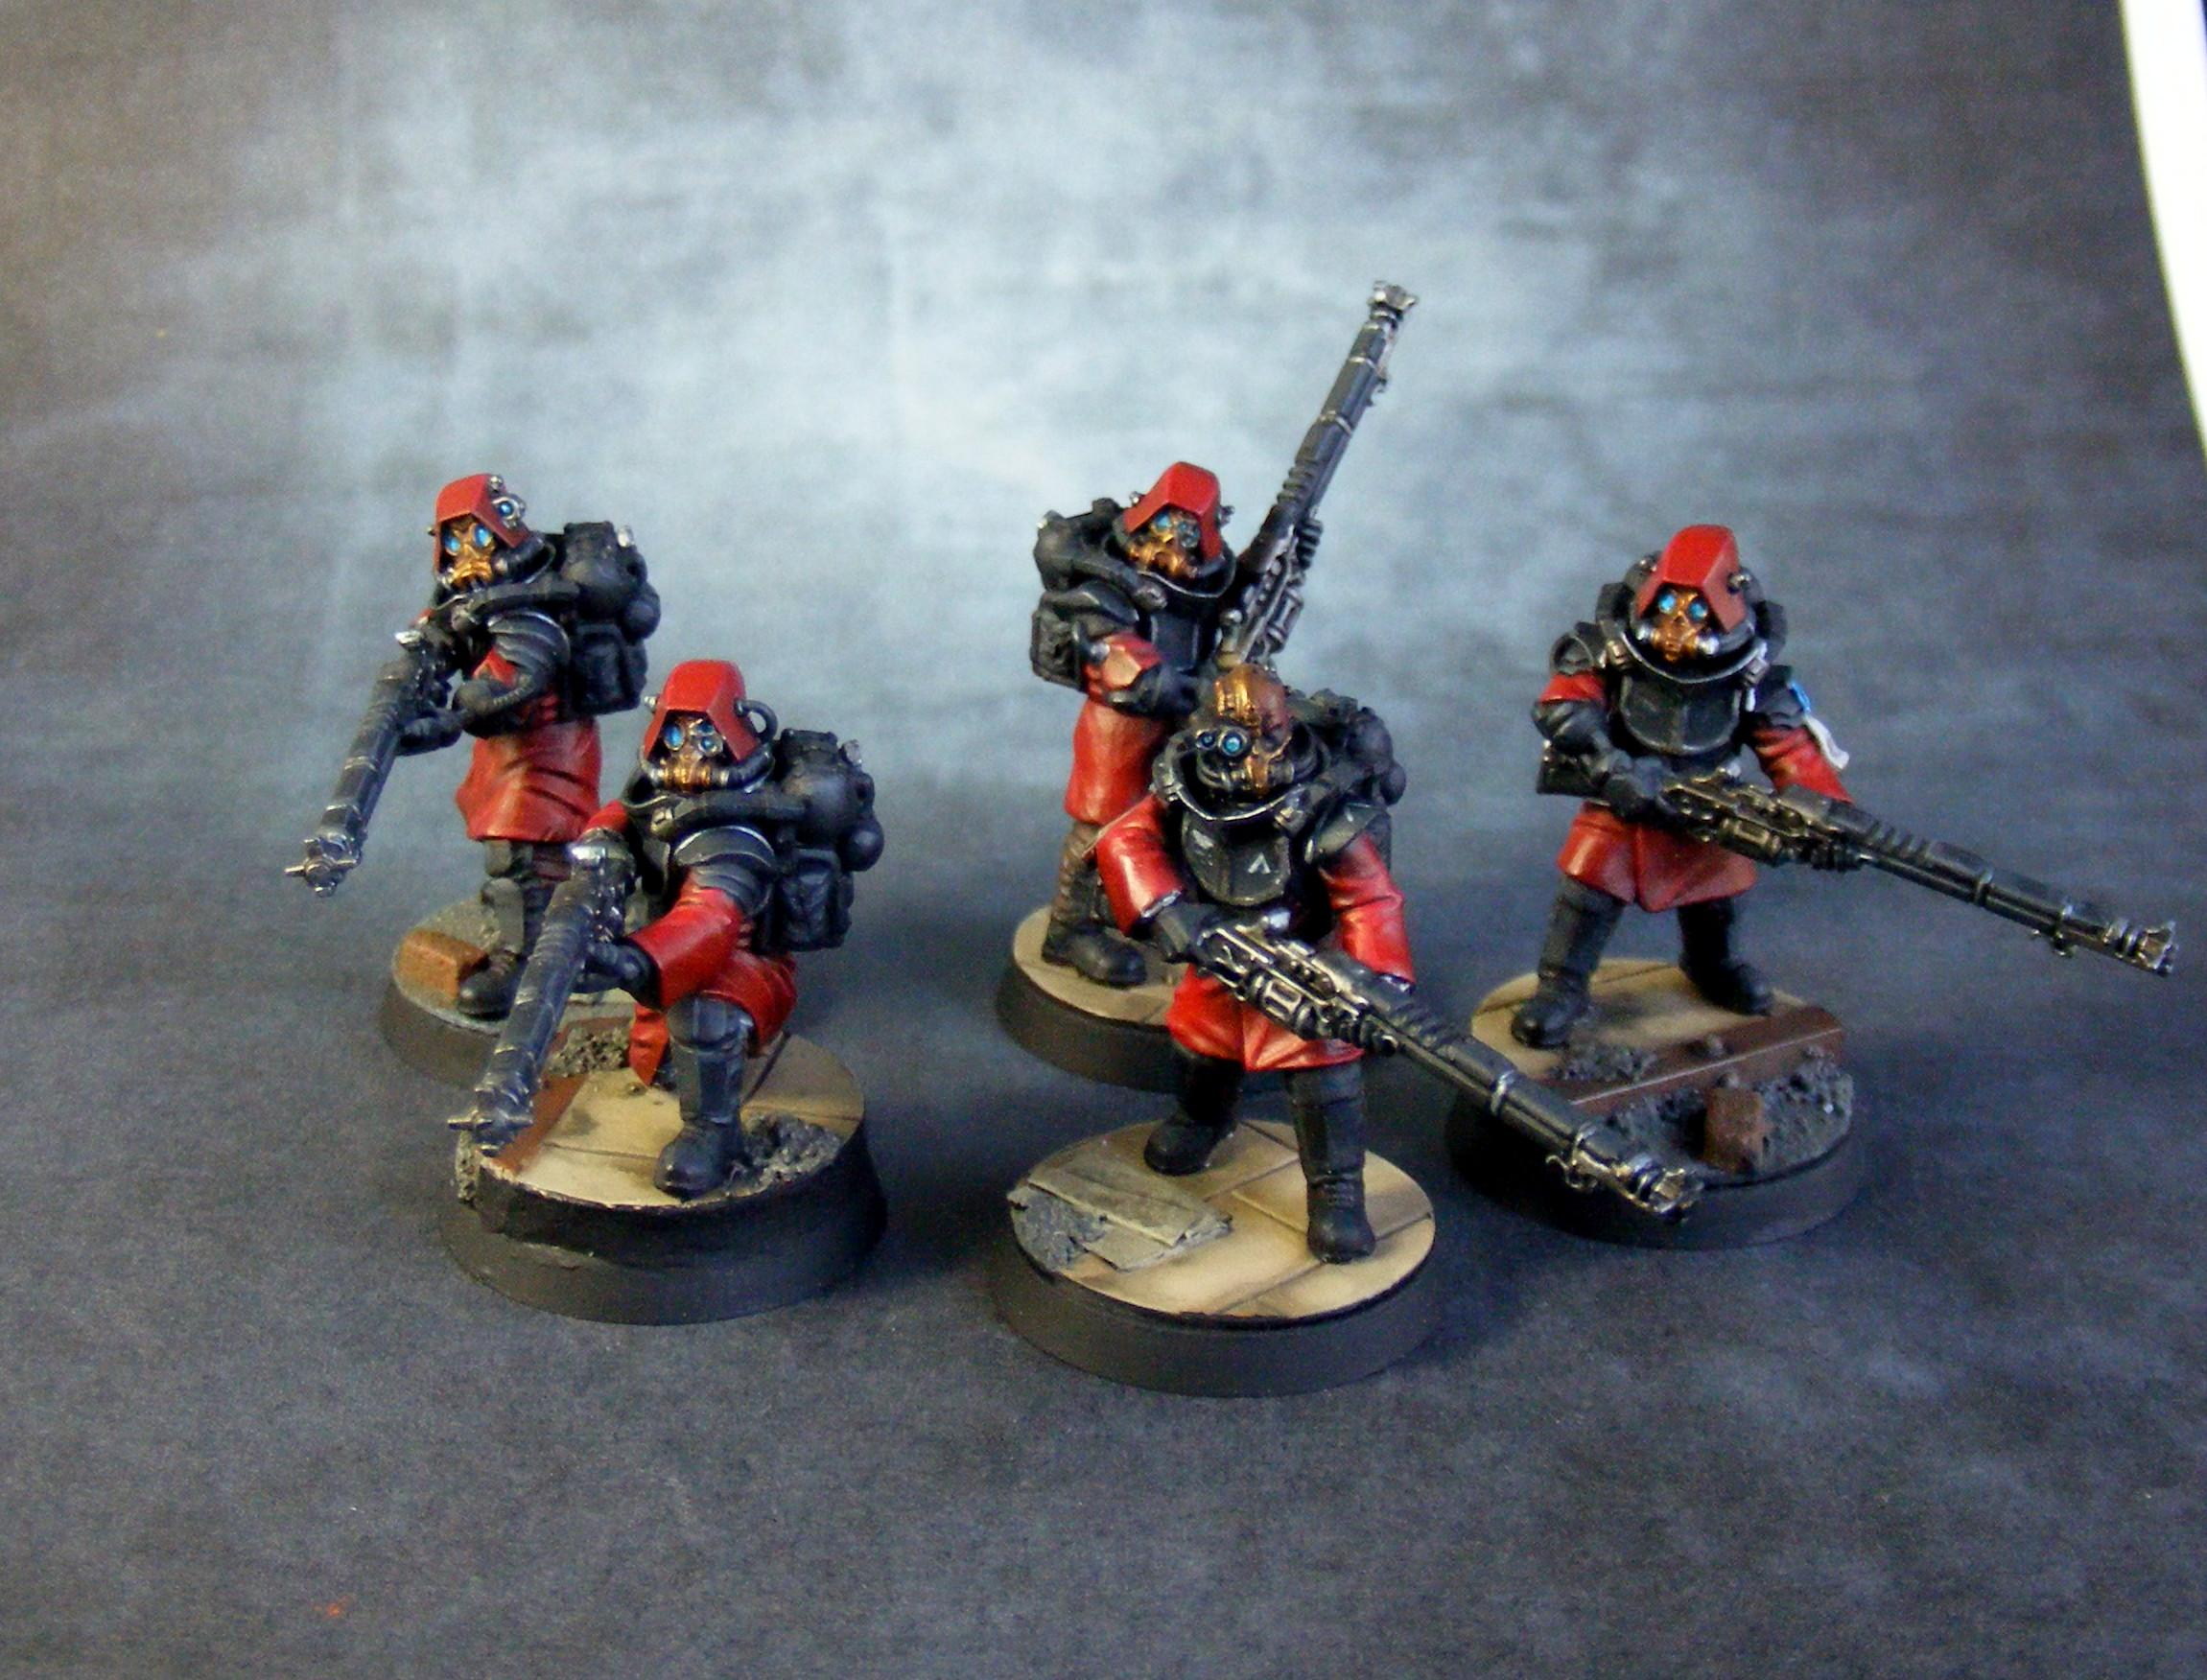 Adeptus Mechanicus, Anvil Industries, Conversion, Skitarii, Warhammer 40,000